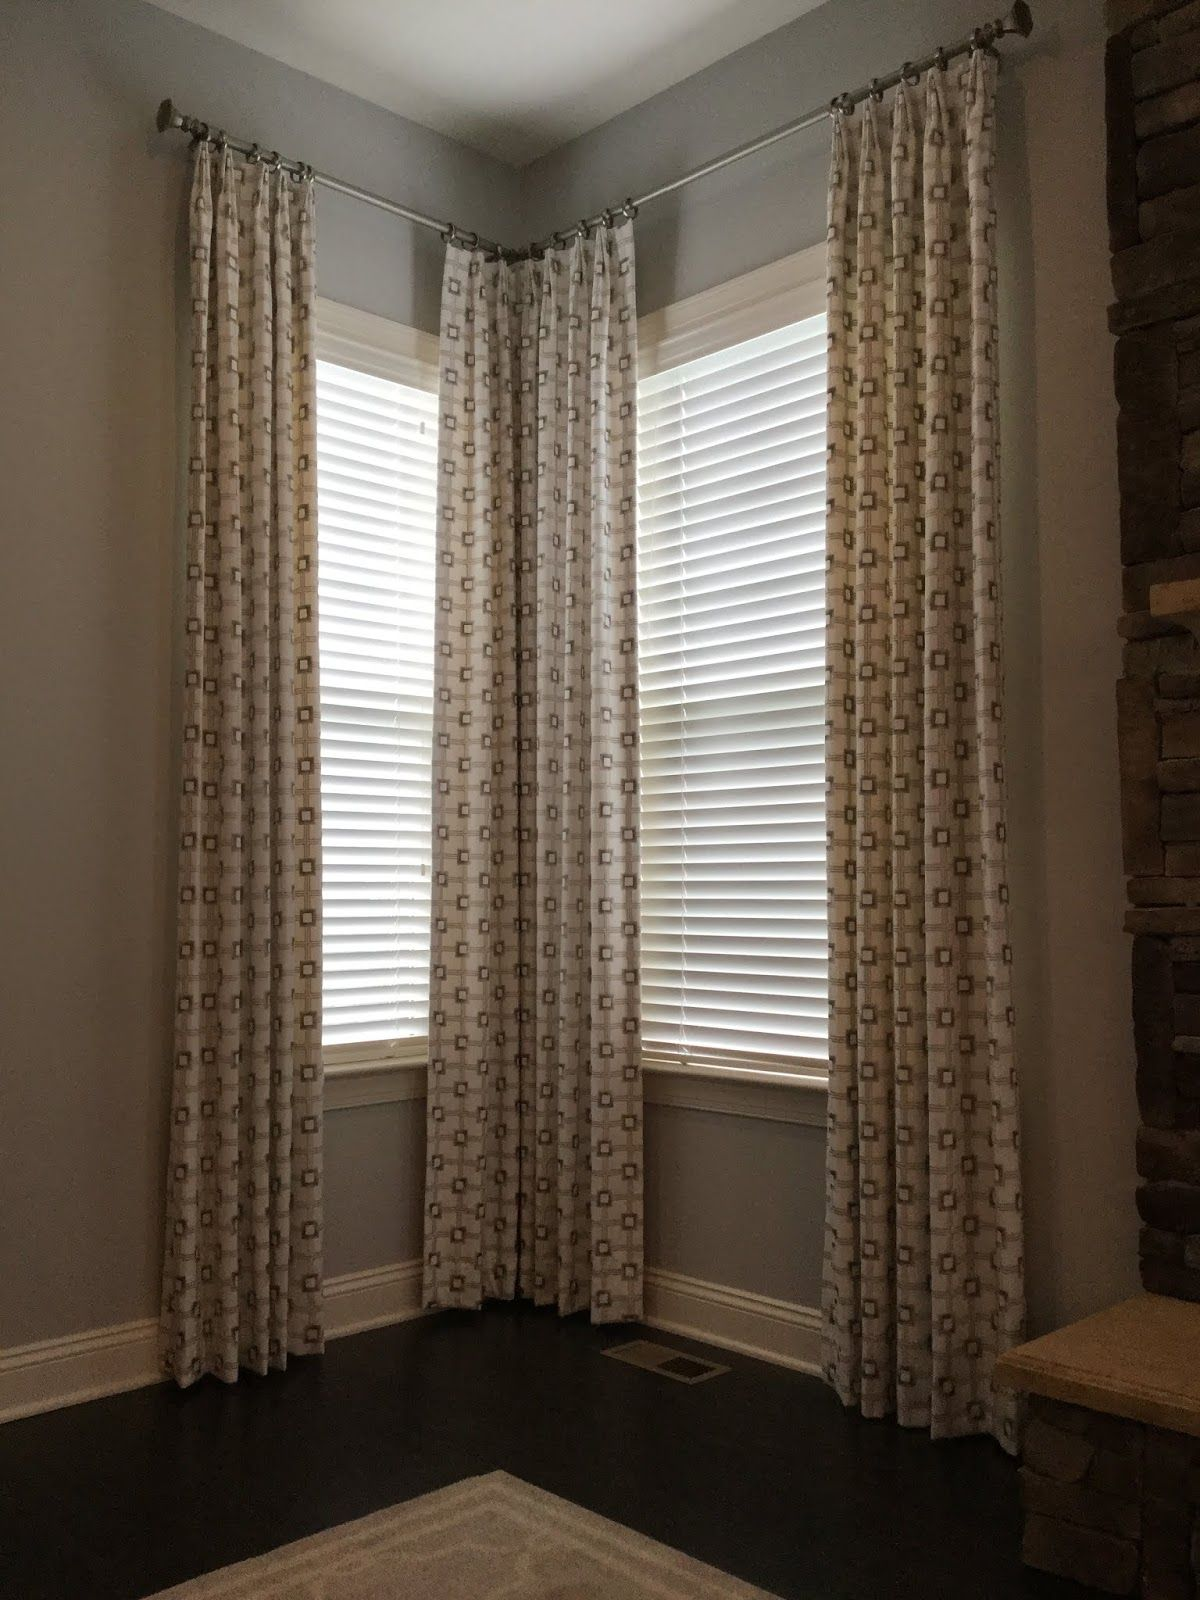 Zivic Fr 3 Jpg 1 200 1 600 Pixels Corner Window Curtains Corner Window Treatments Corner Window